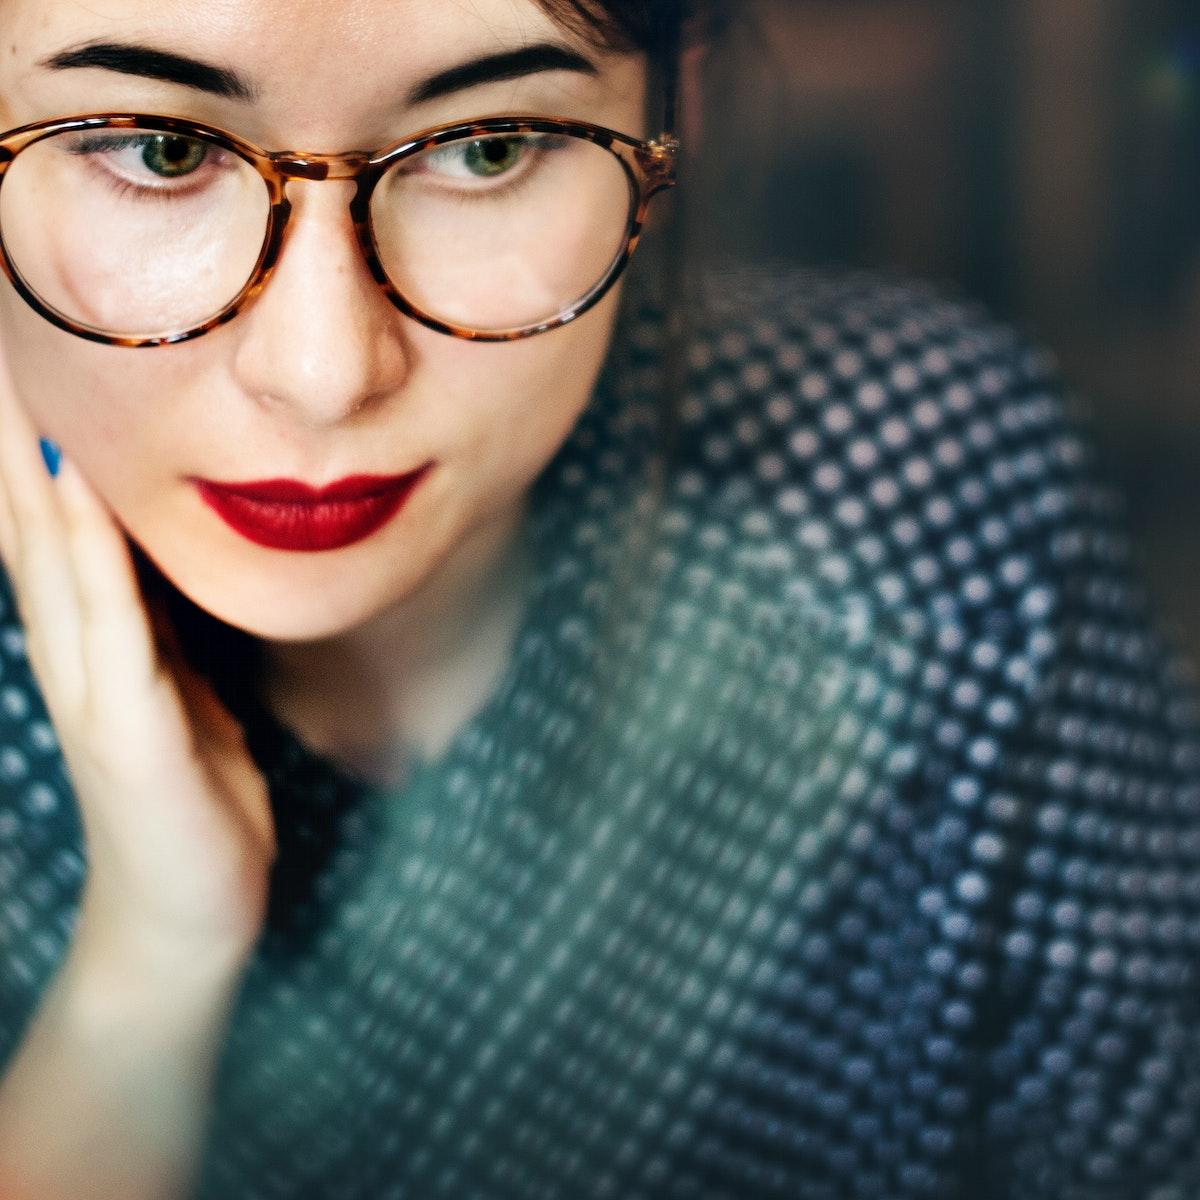 Closeup of thougtful woman wearing eyeglasses portrait